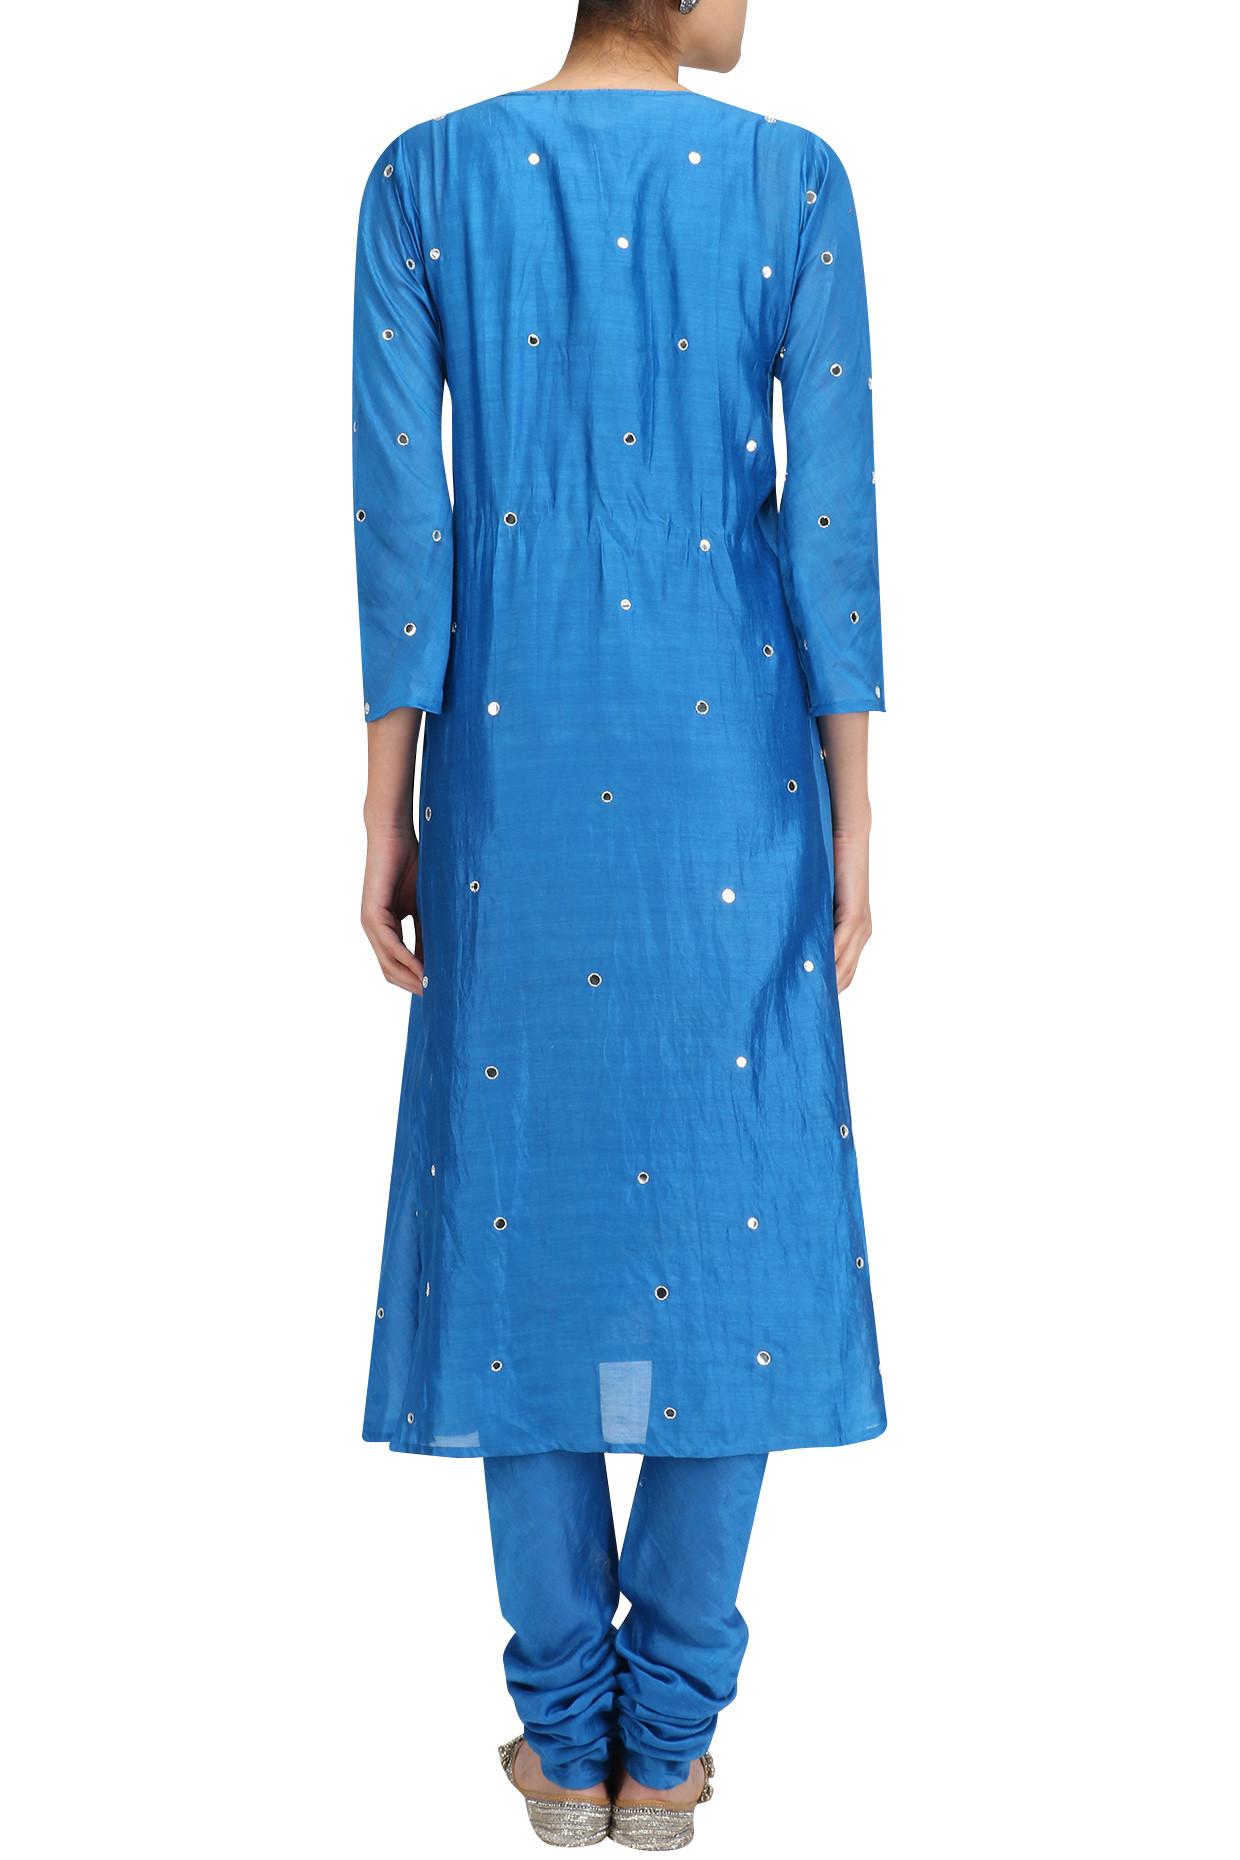 Turquoise Blue Dots Embroidered Straight Kurta Set by Surendri